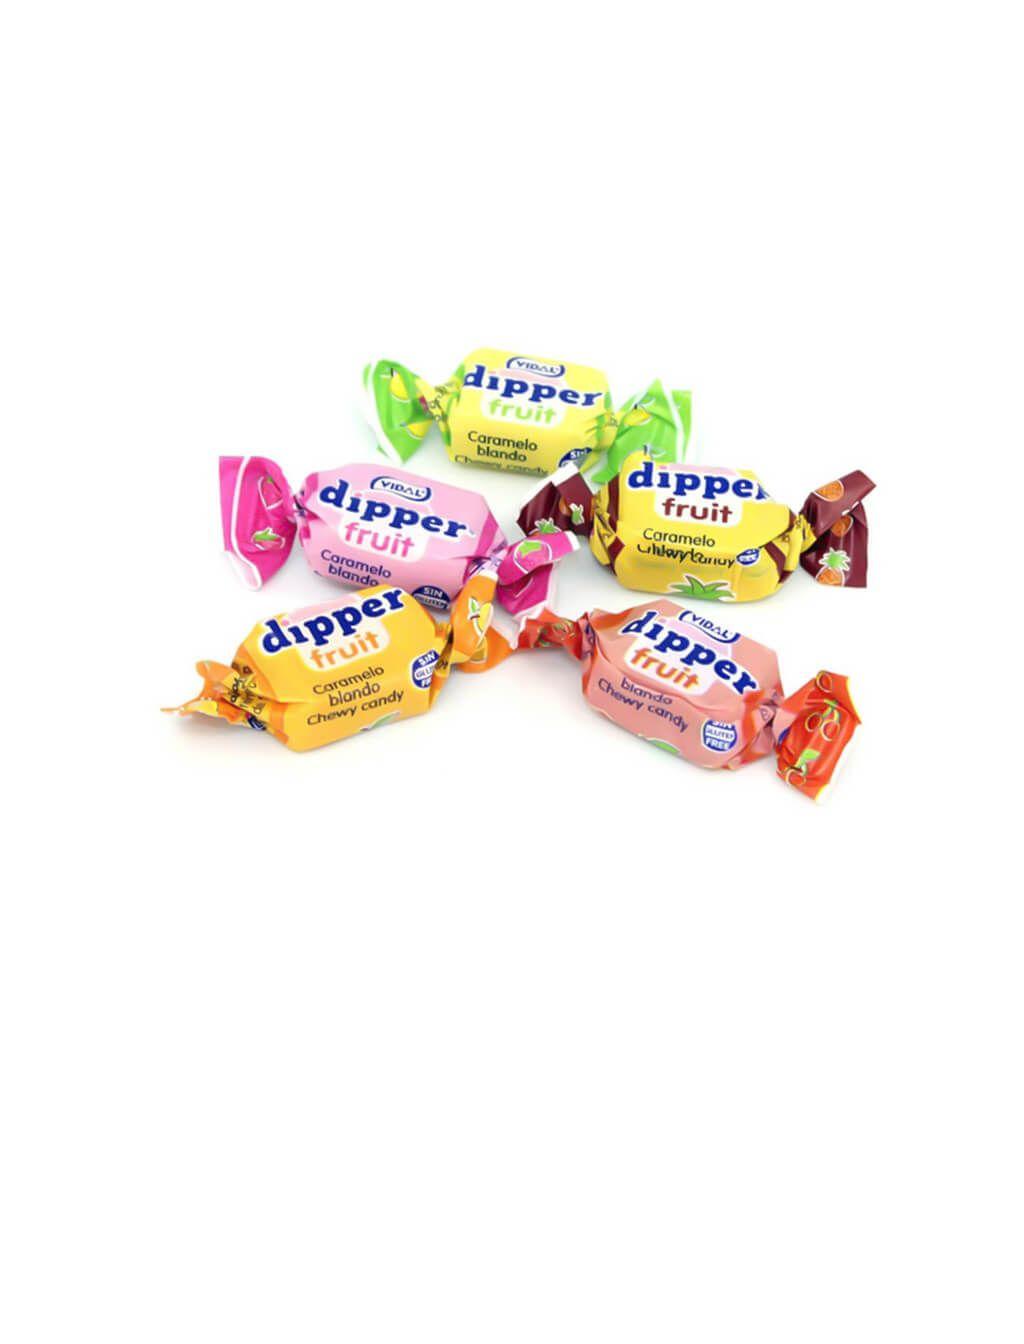 Dipper Fruit bolsa 1 Kg